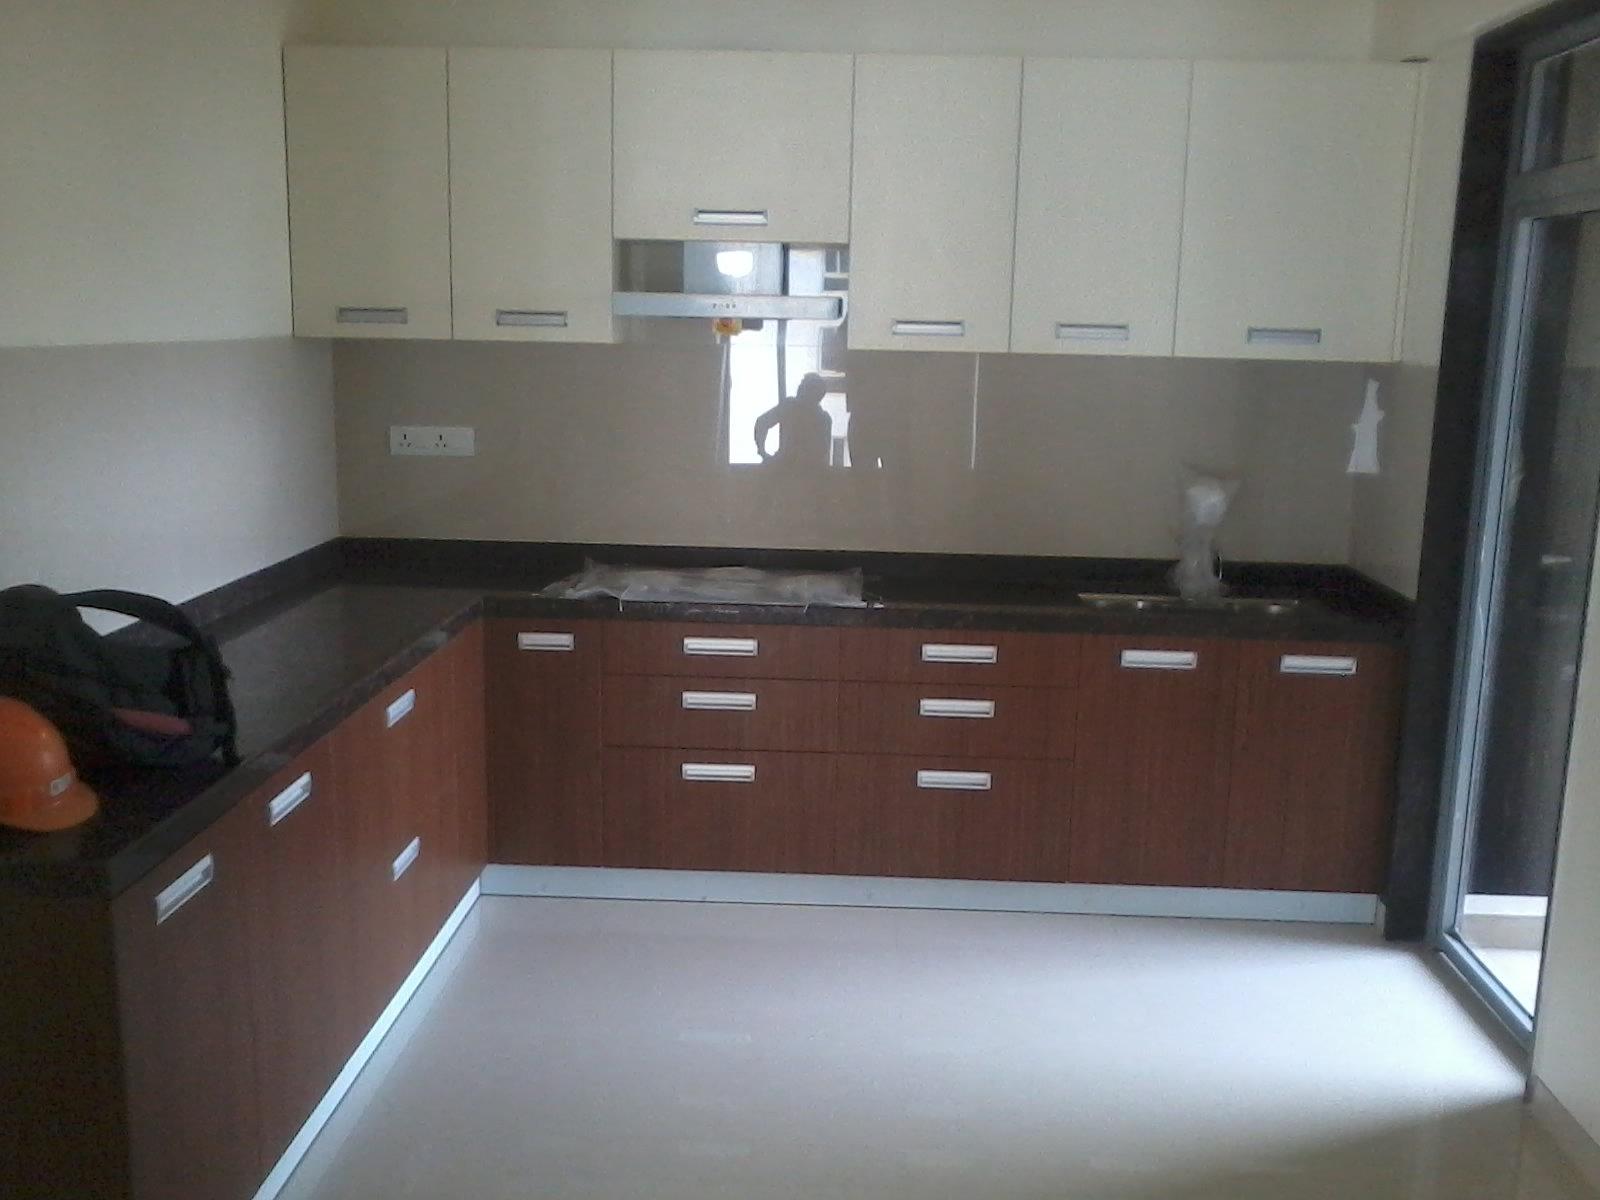 Modular kitchen mumbai laviishups img3556g create your wix site you can do it yourself start now solutioingenieria Gallery